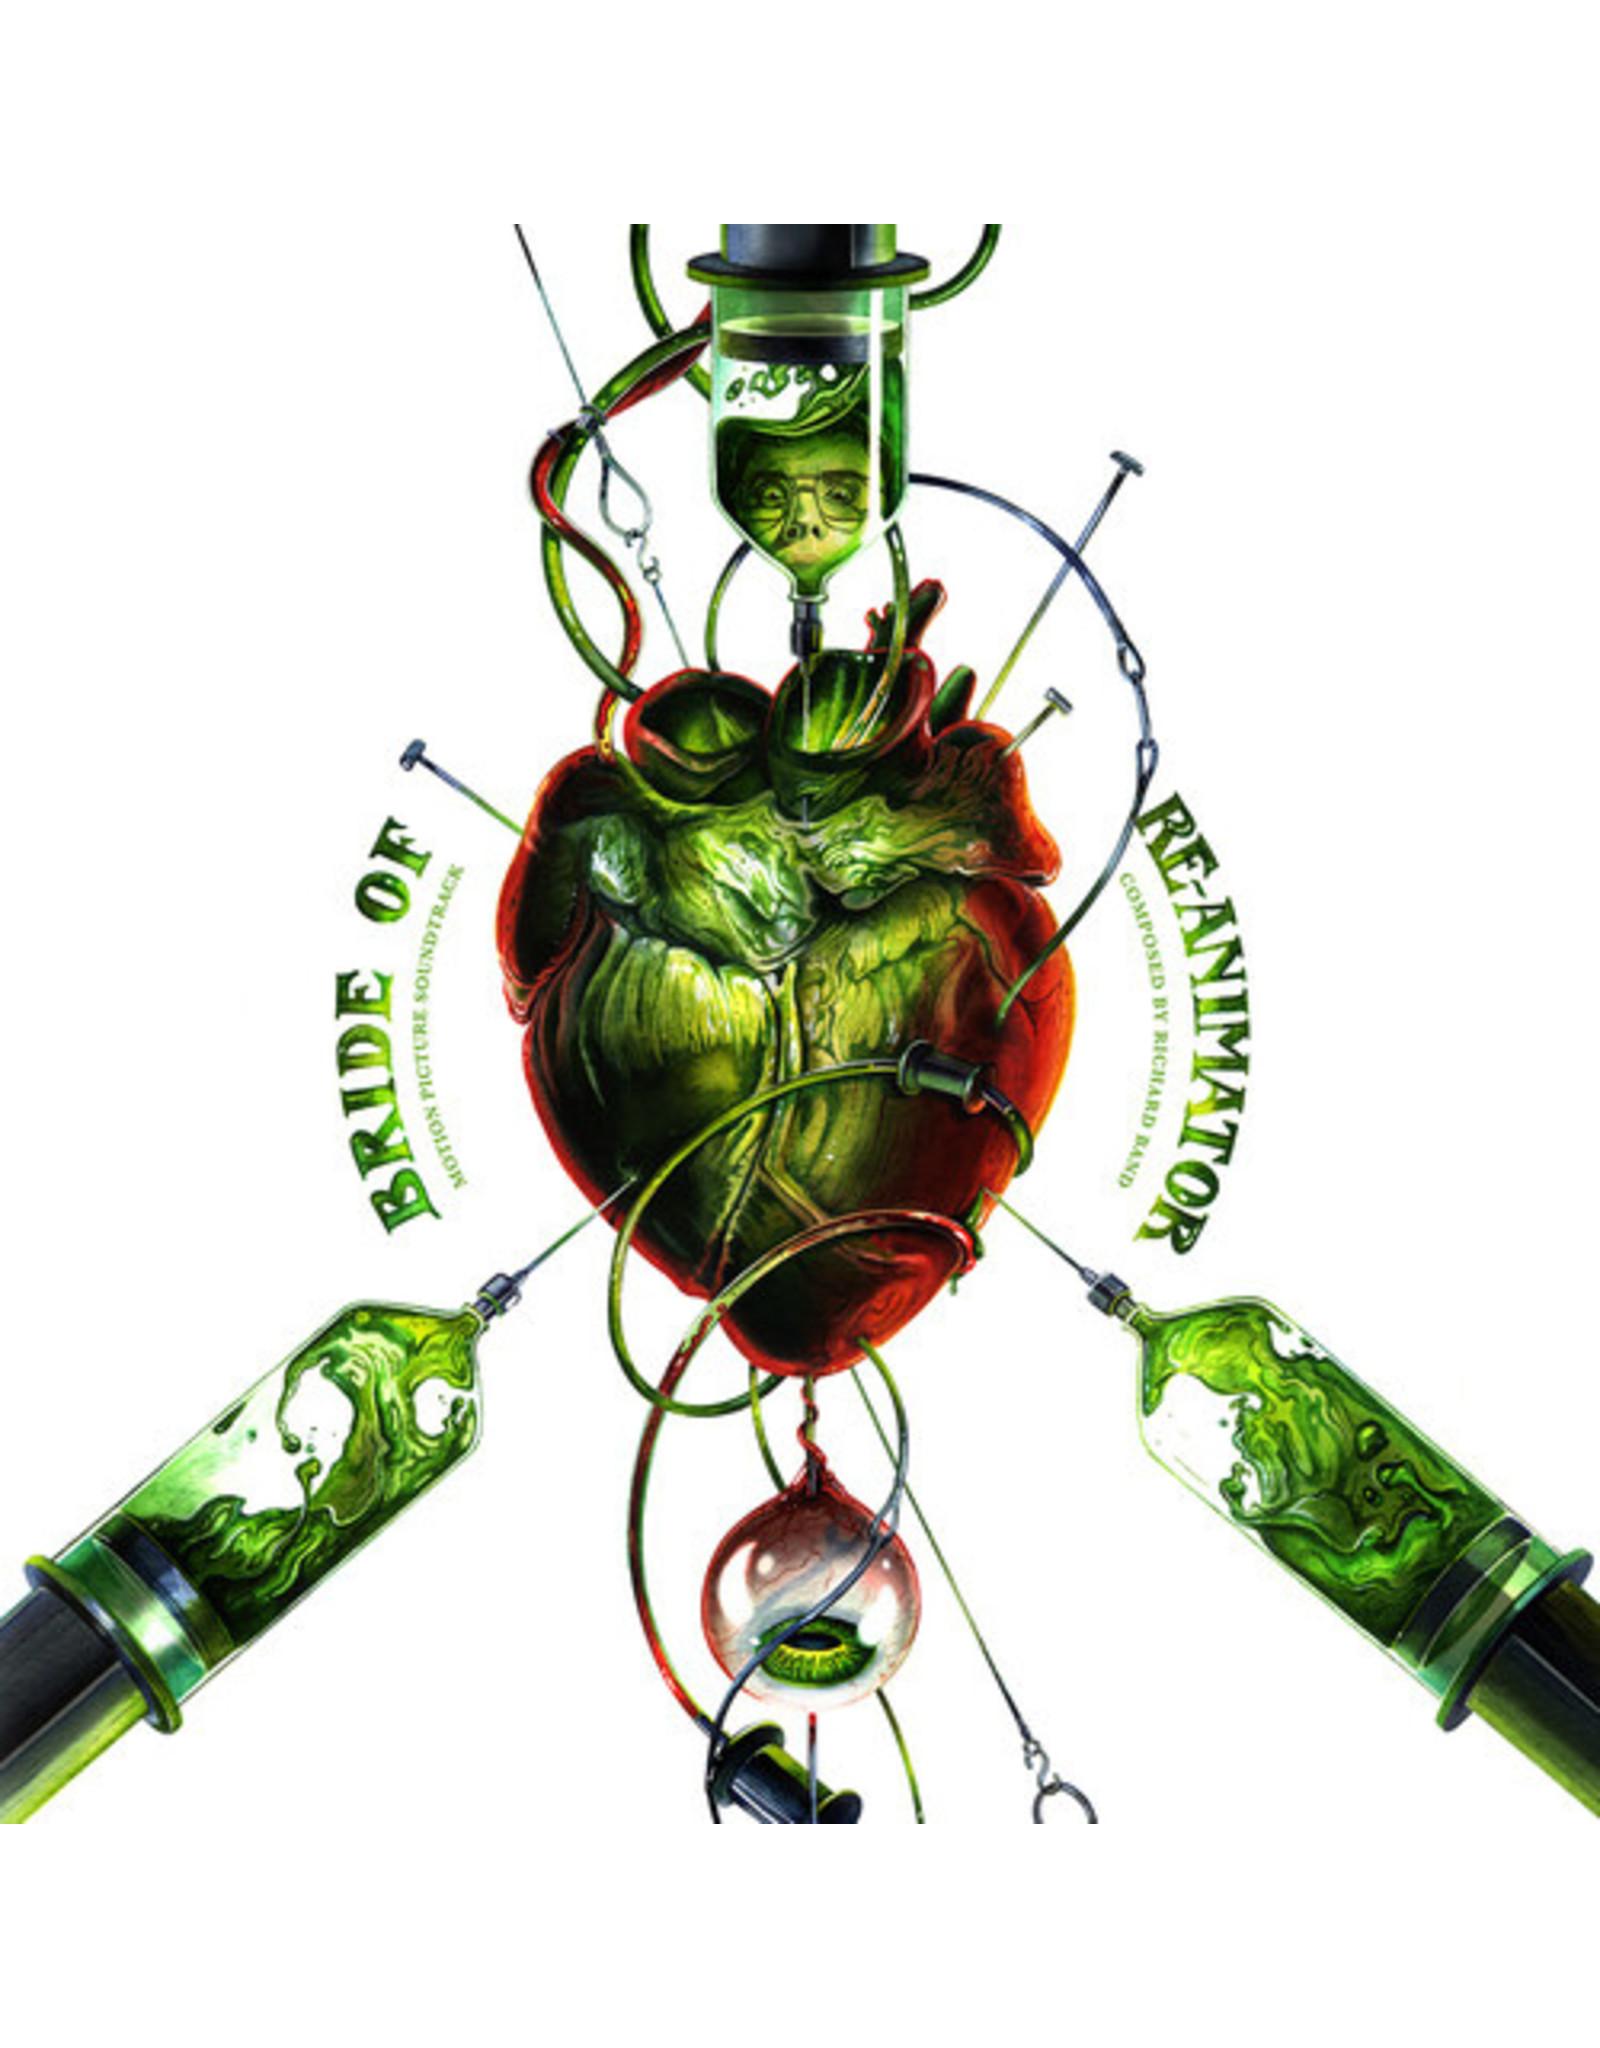 New Vinyl Richard Band - Bride Of Reanimator OST 2LP